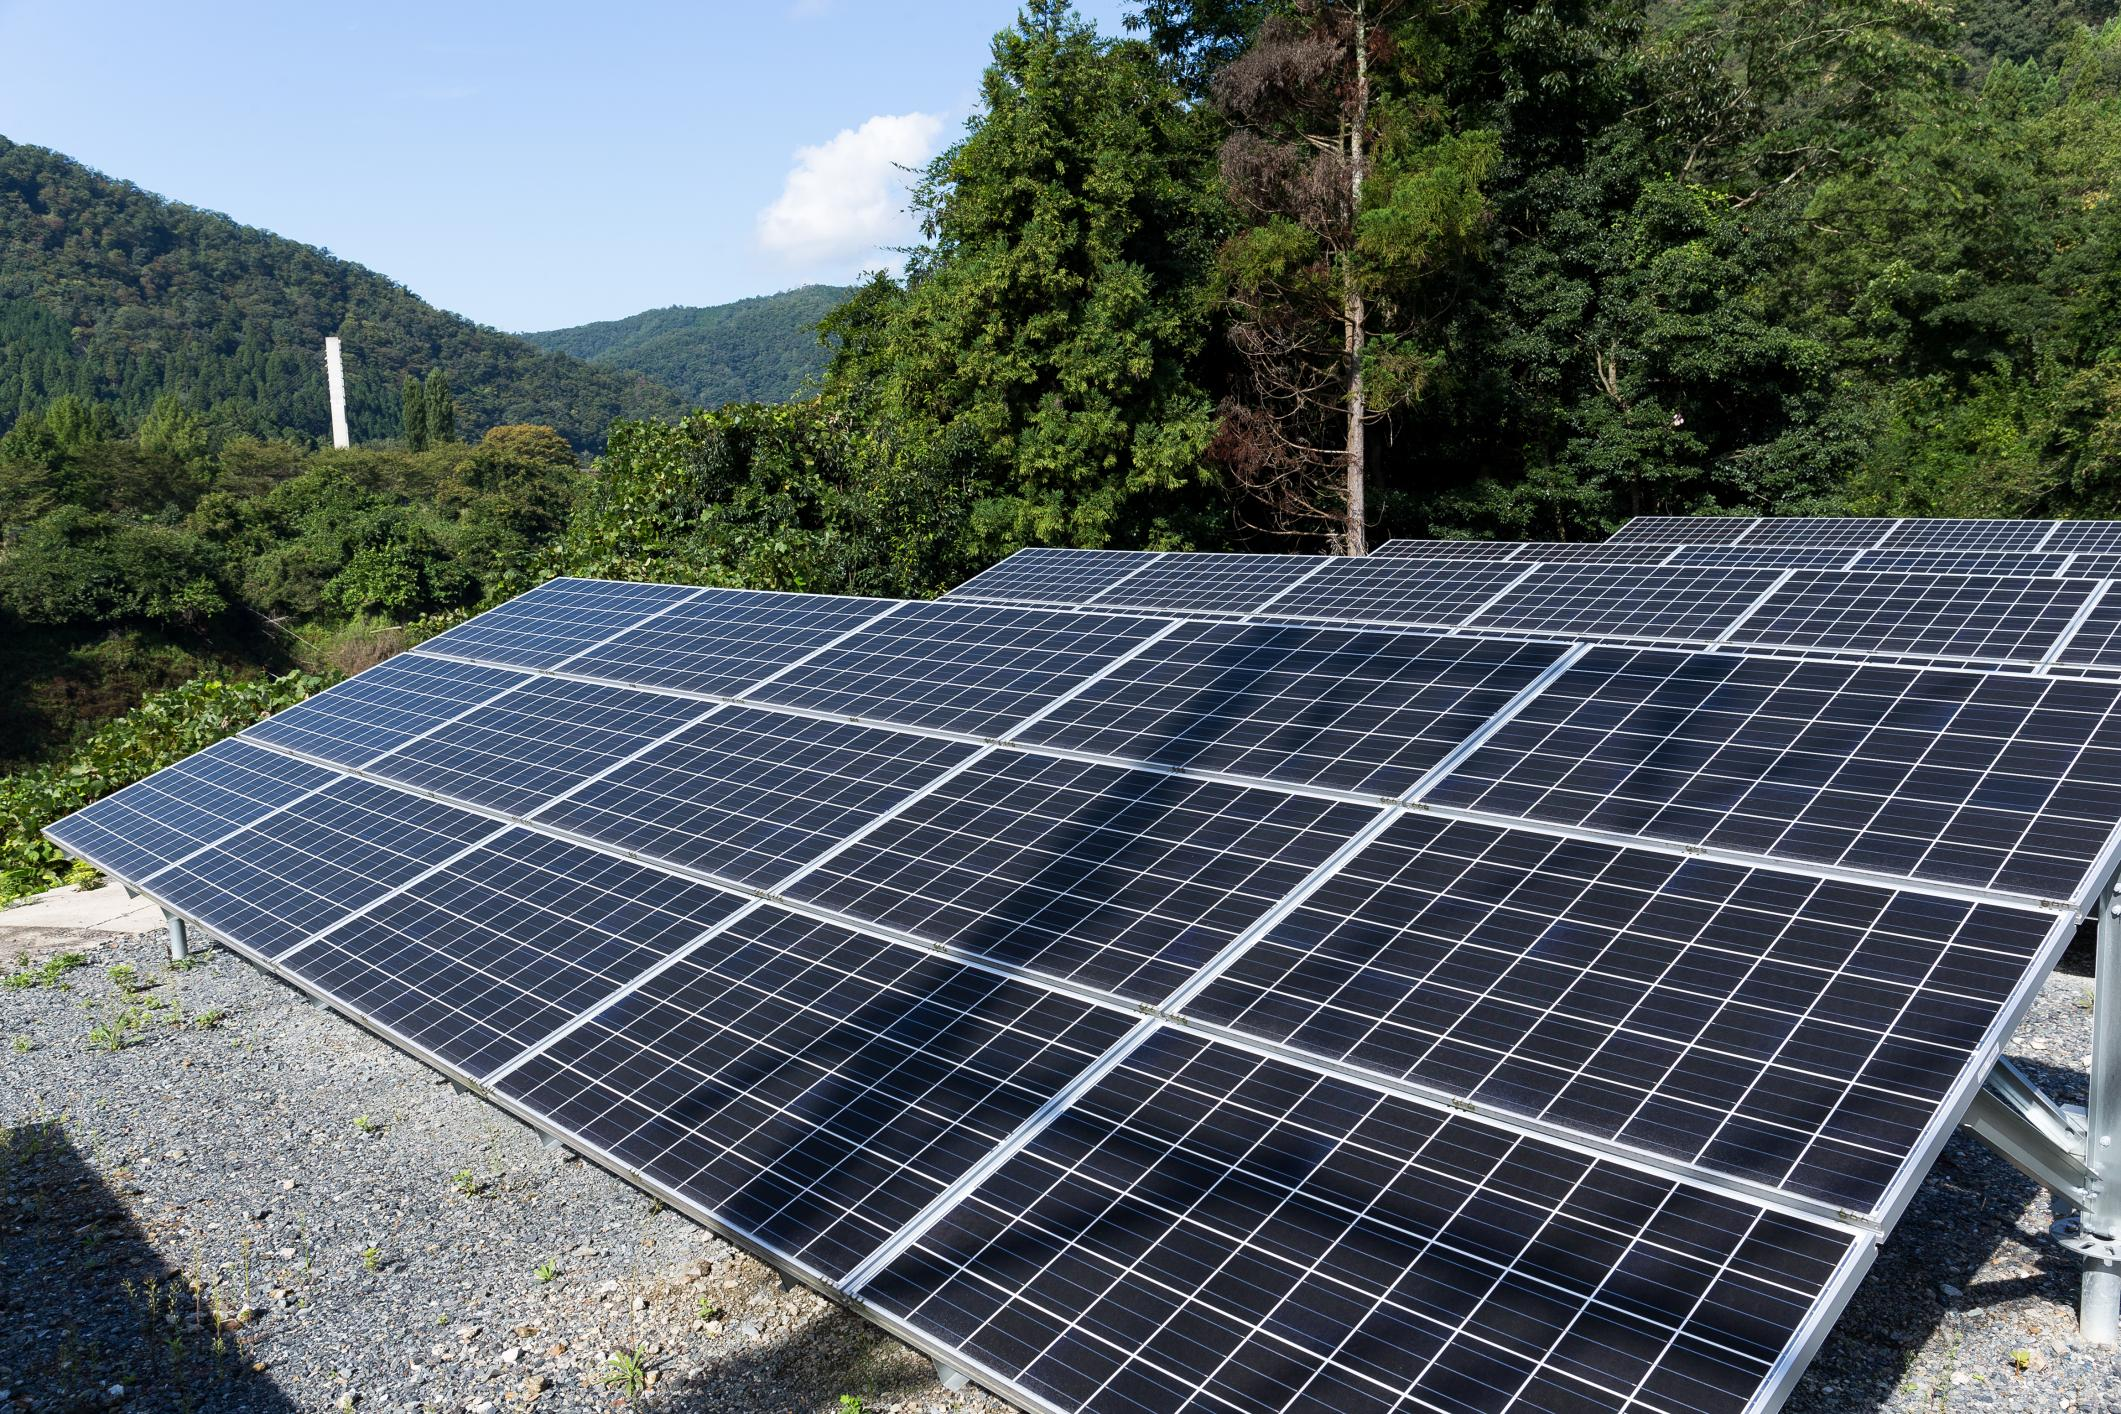 small field of solar panels